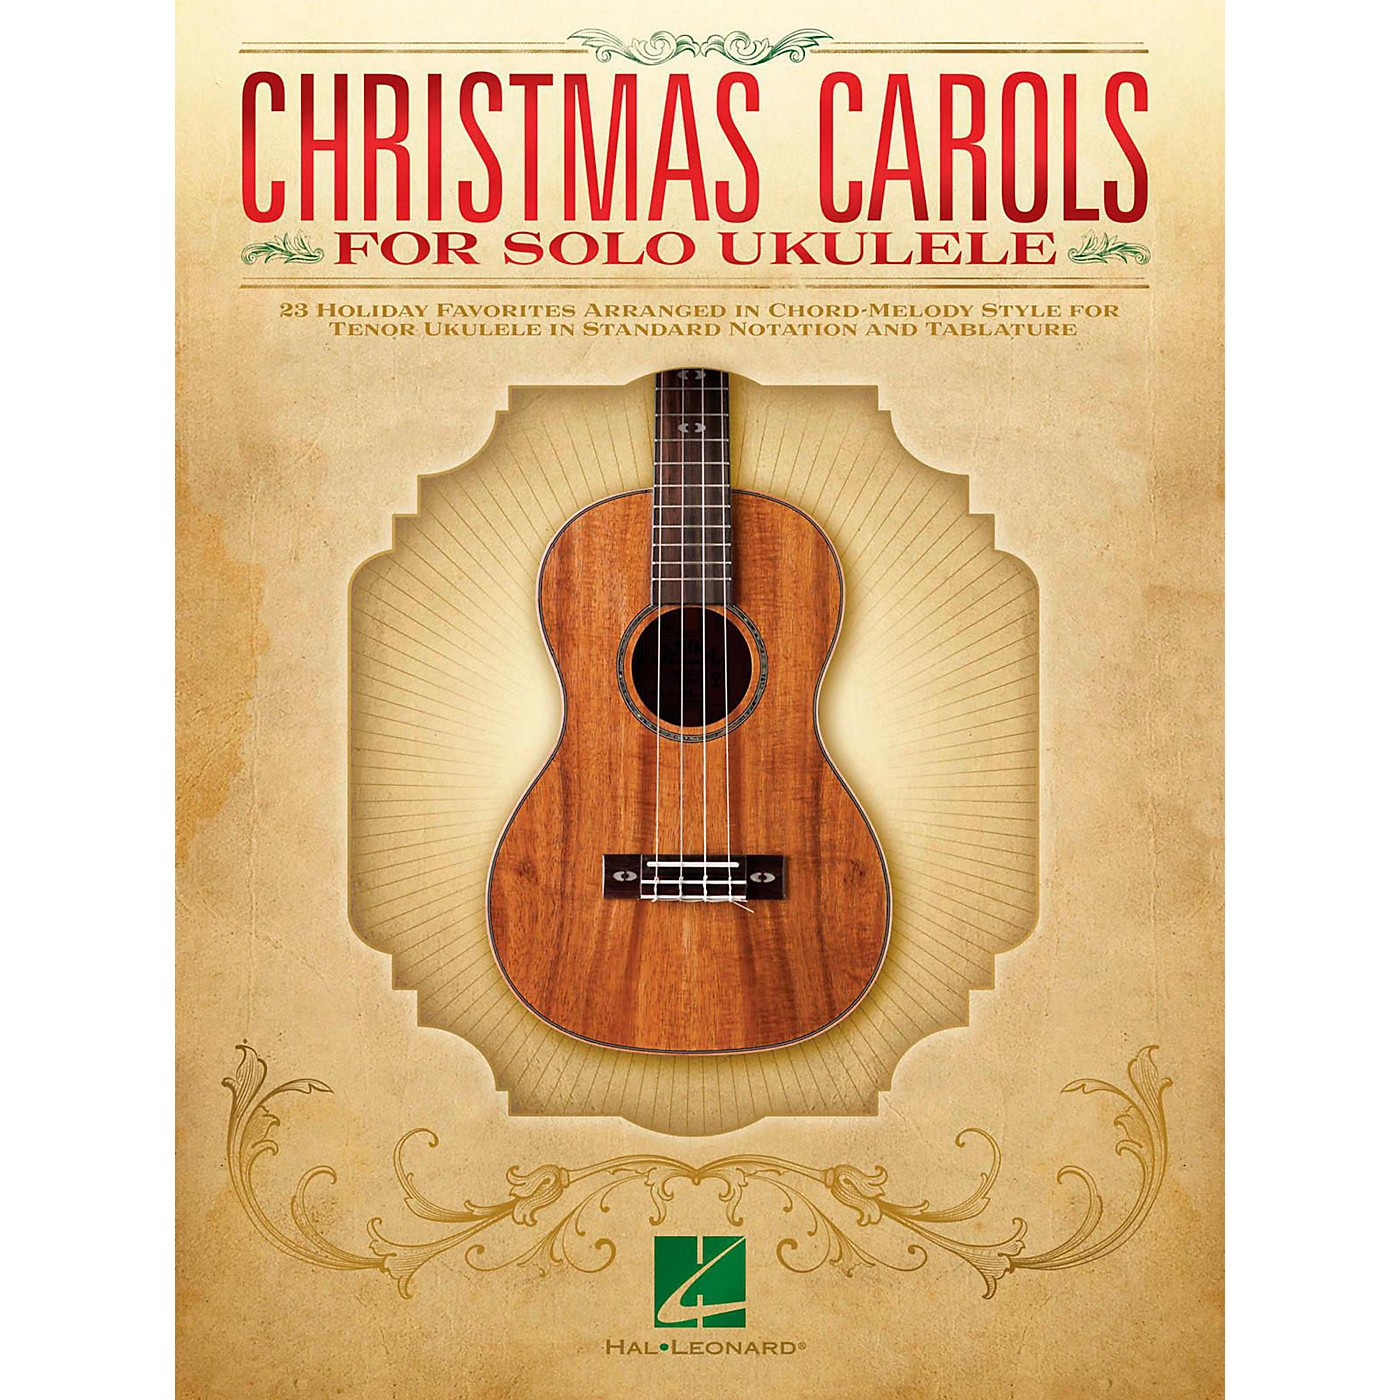 Hal Leonard Christmas Carols For Solo Ukulele - 23 Favorites Arranged In Chord-Melody Style For Tenor Uke thumbnail